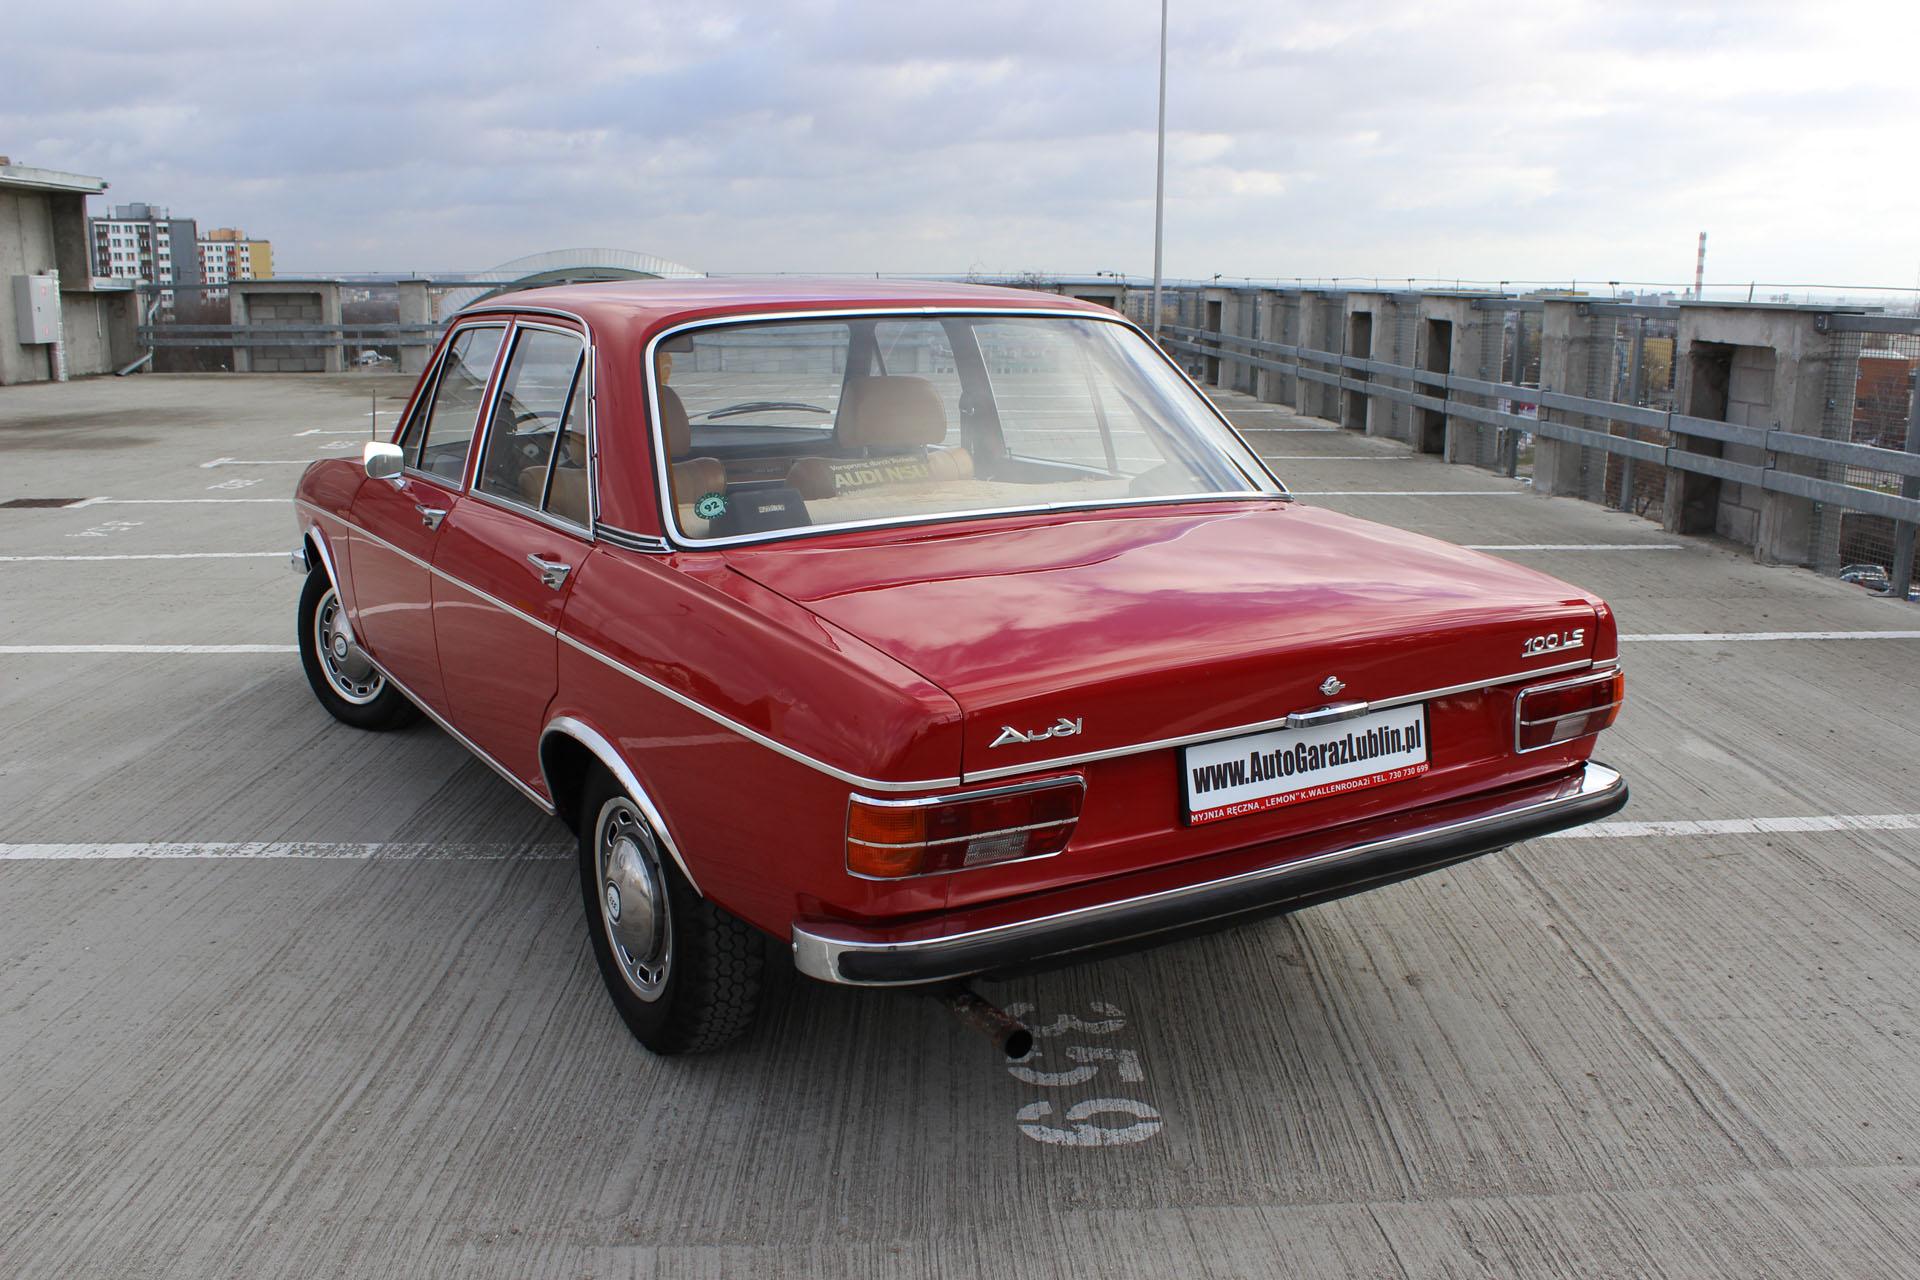 Audi 100 LS 1974 gieldaklasykow pl audi-100ls-04